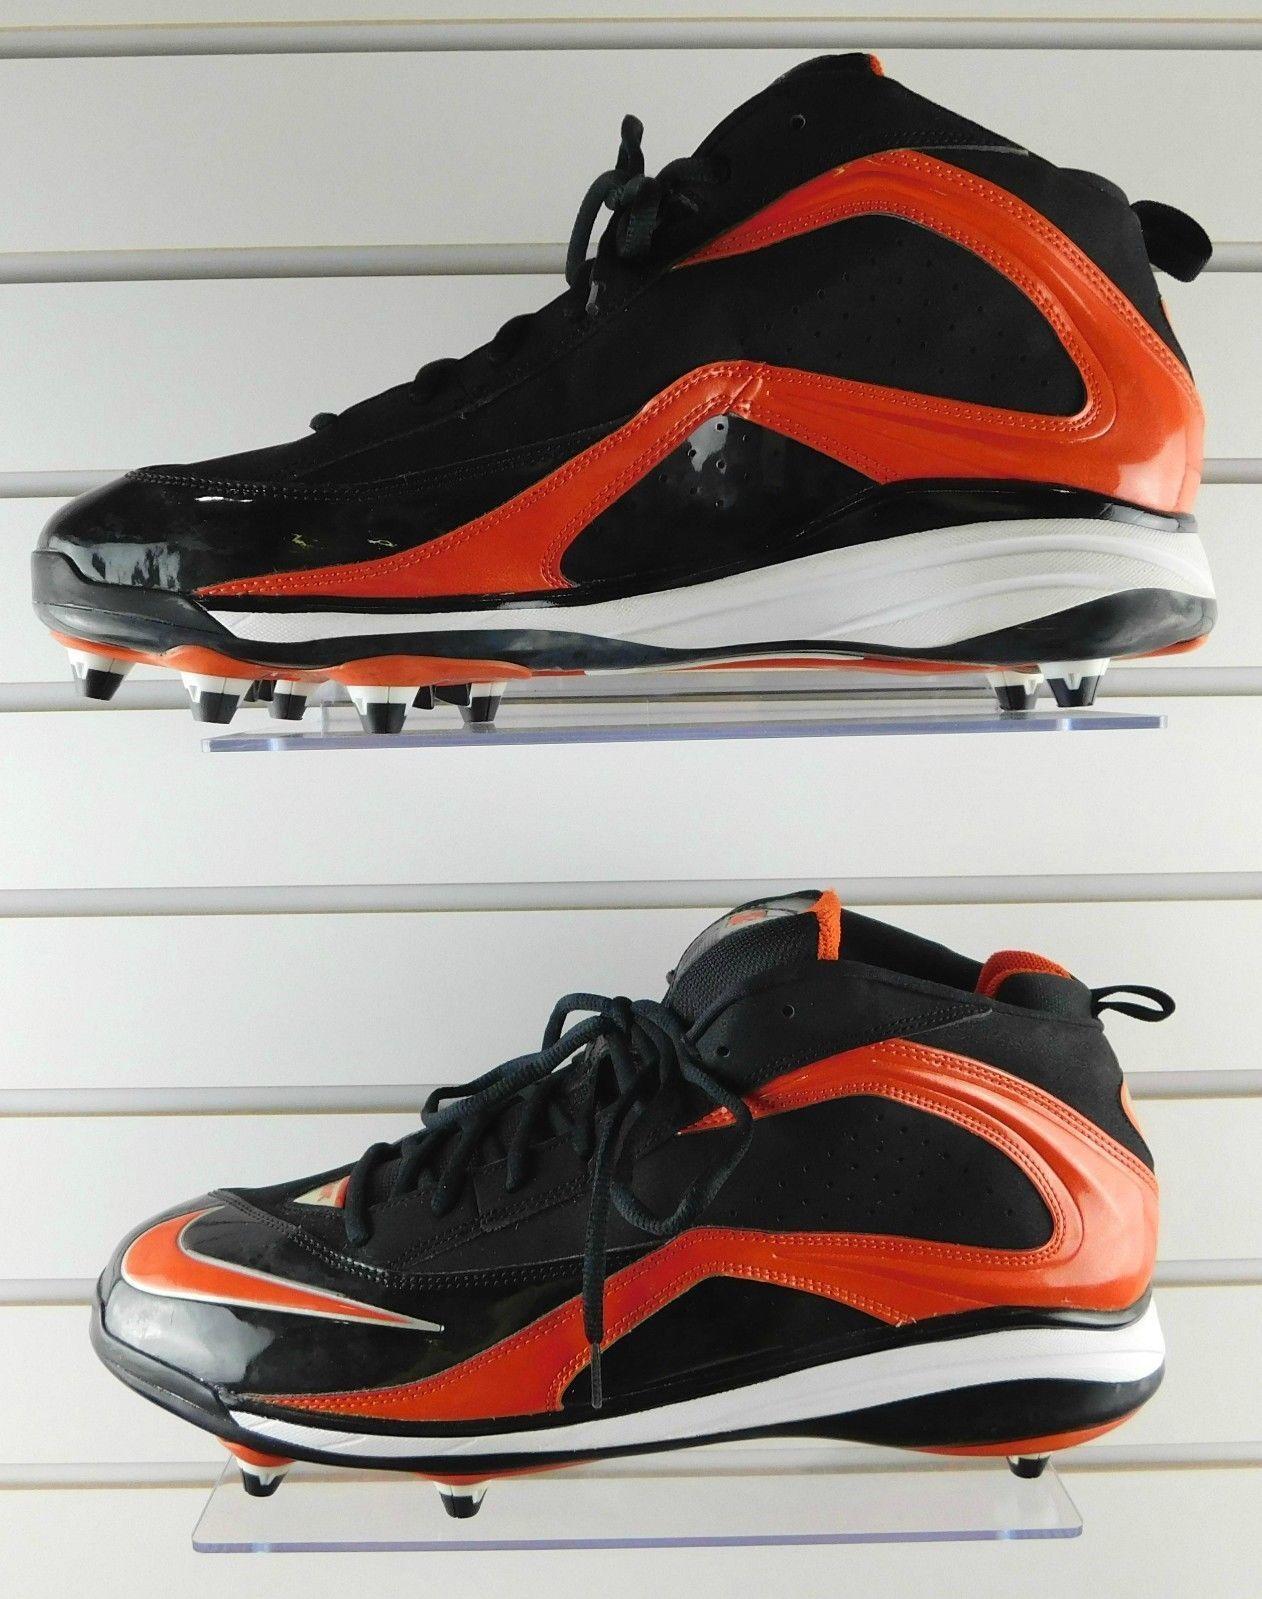 Mis Sportive Ctr360 Scarpa Gyy7bf6v Fg Maestri Calcio 6 Scarpe Nike 5 oeQEdrCxBW